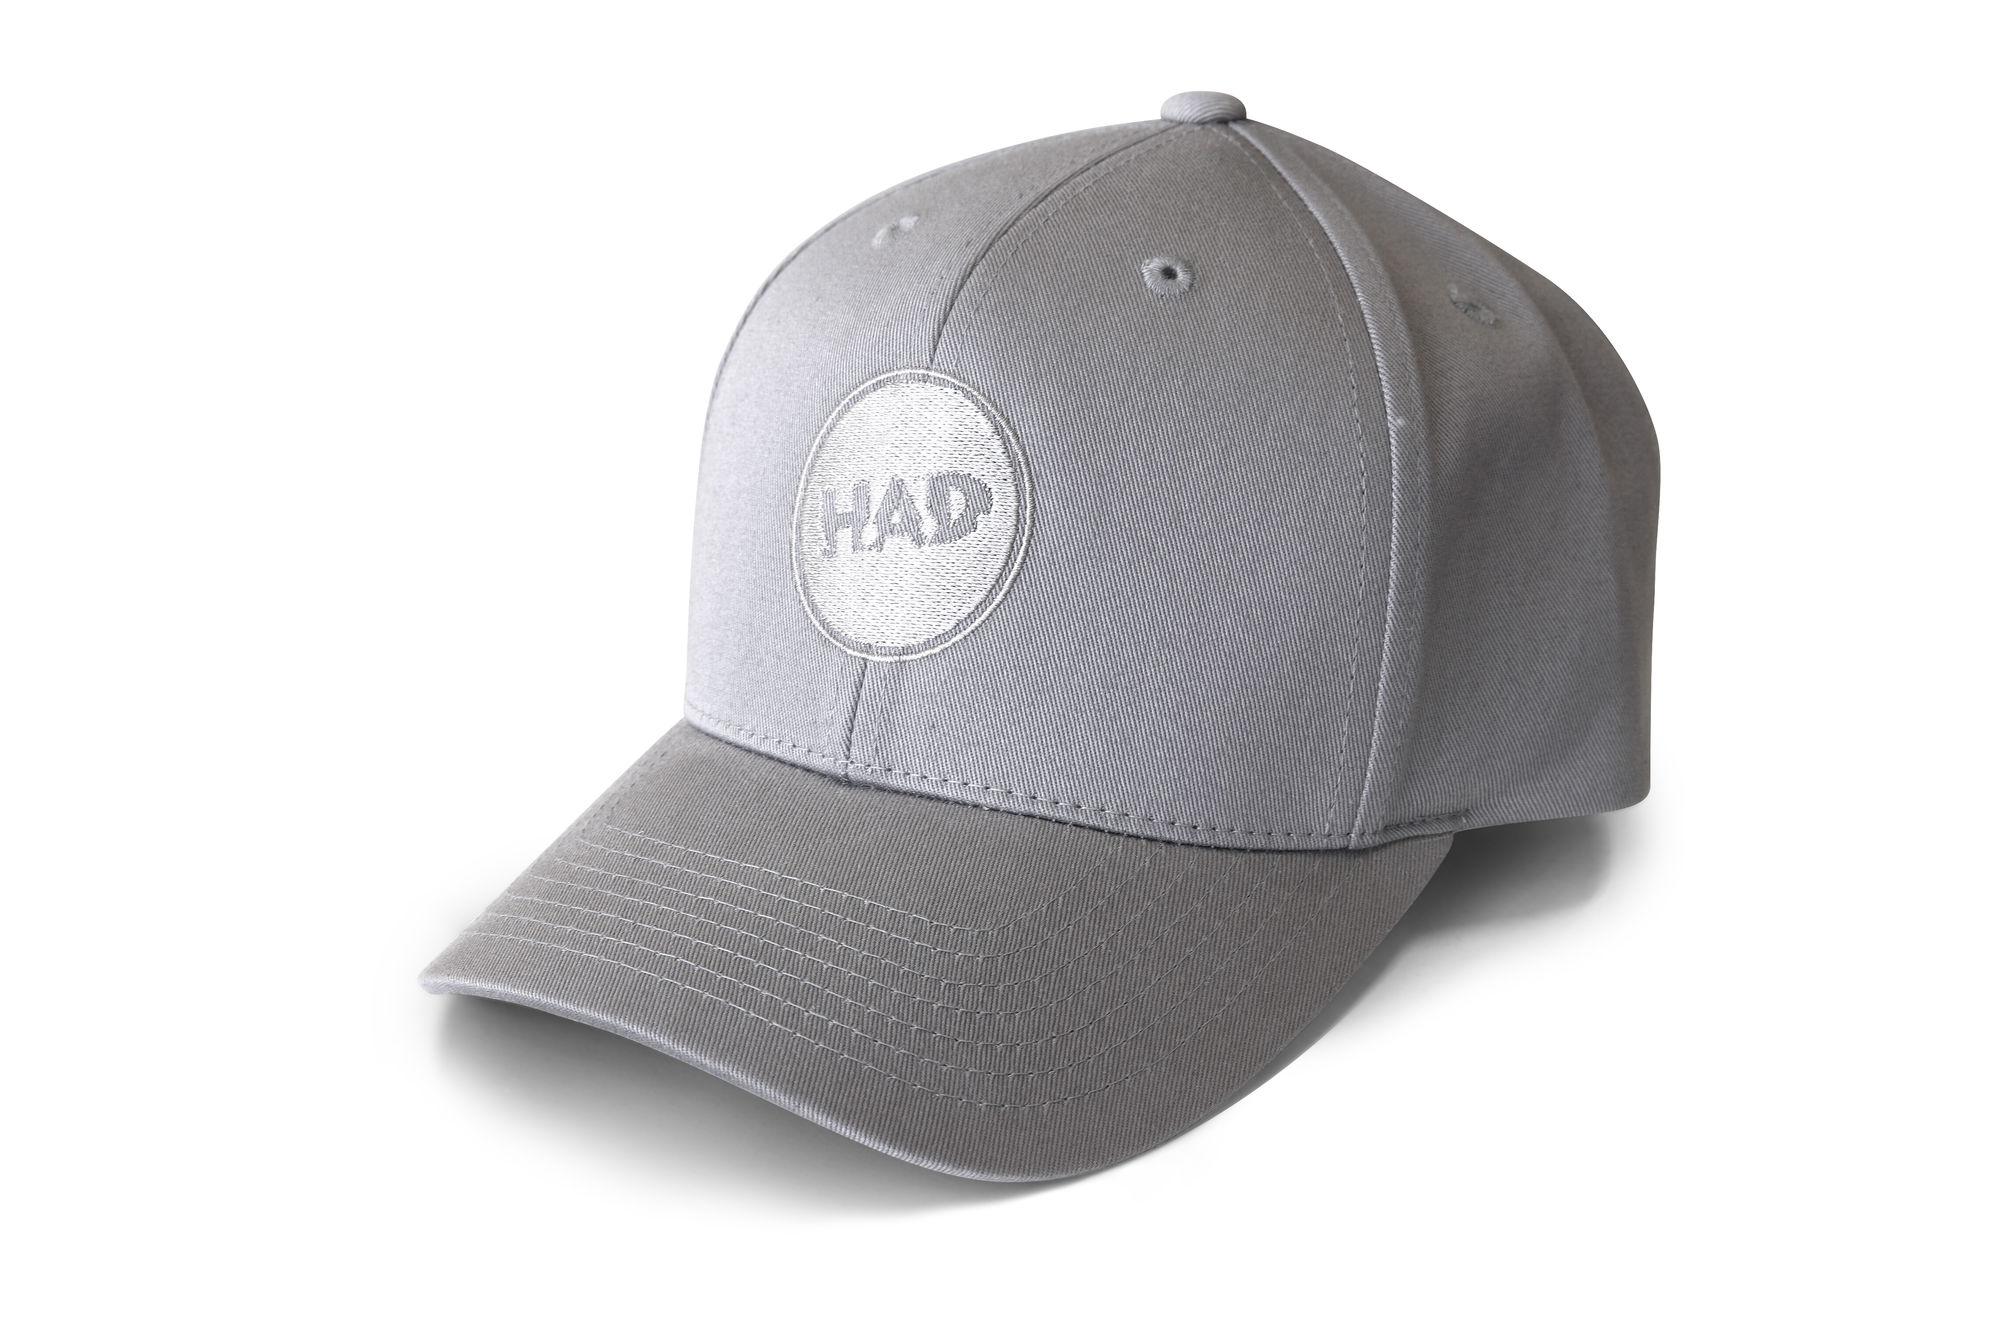 ProFeet HAD Cap in Silber